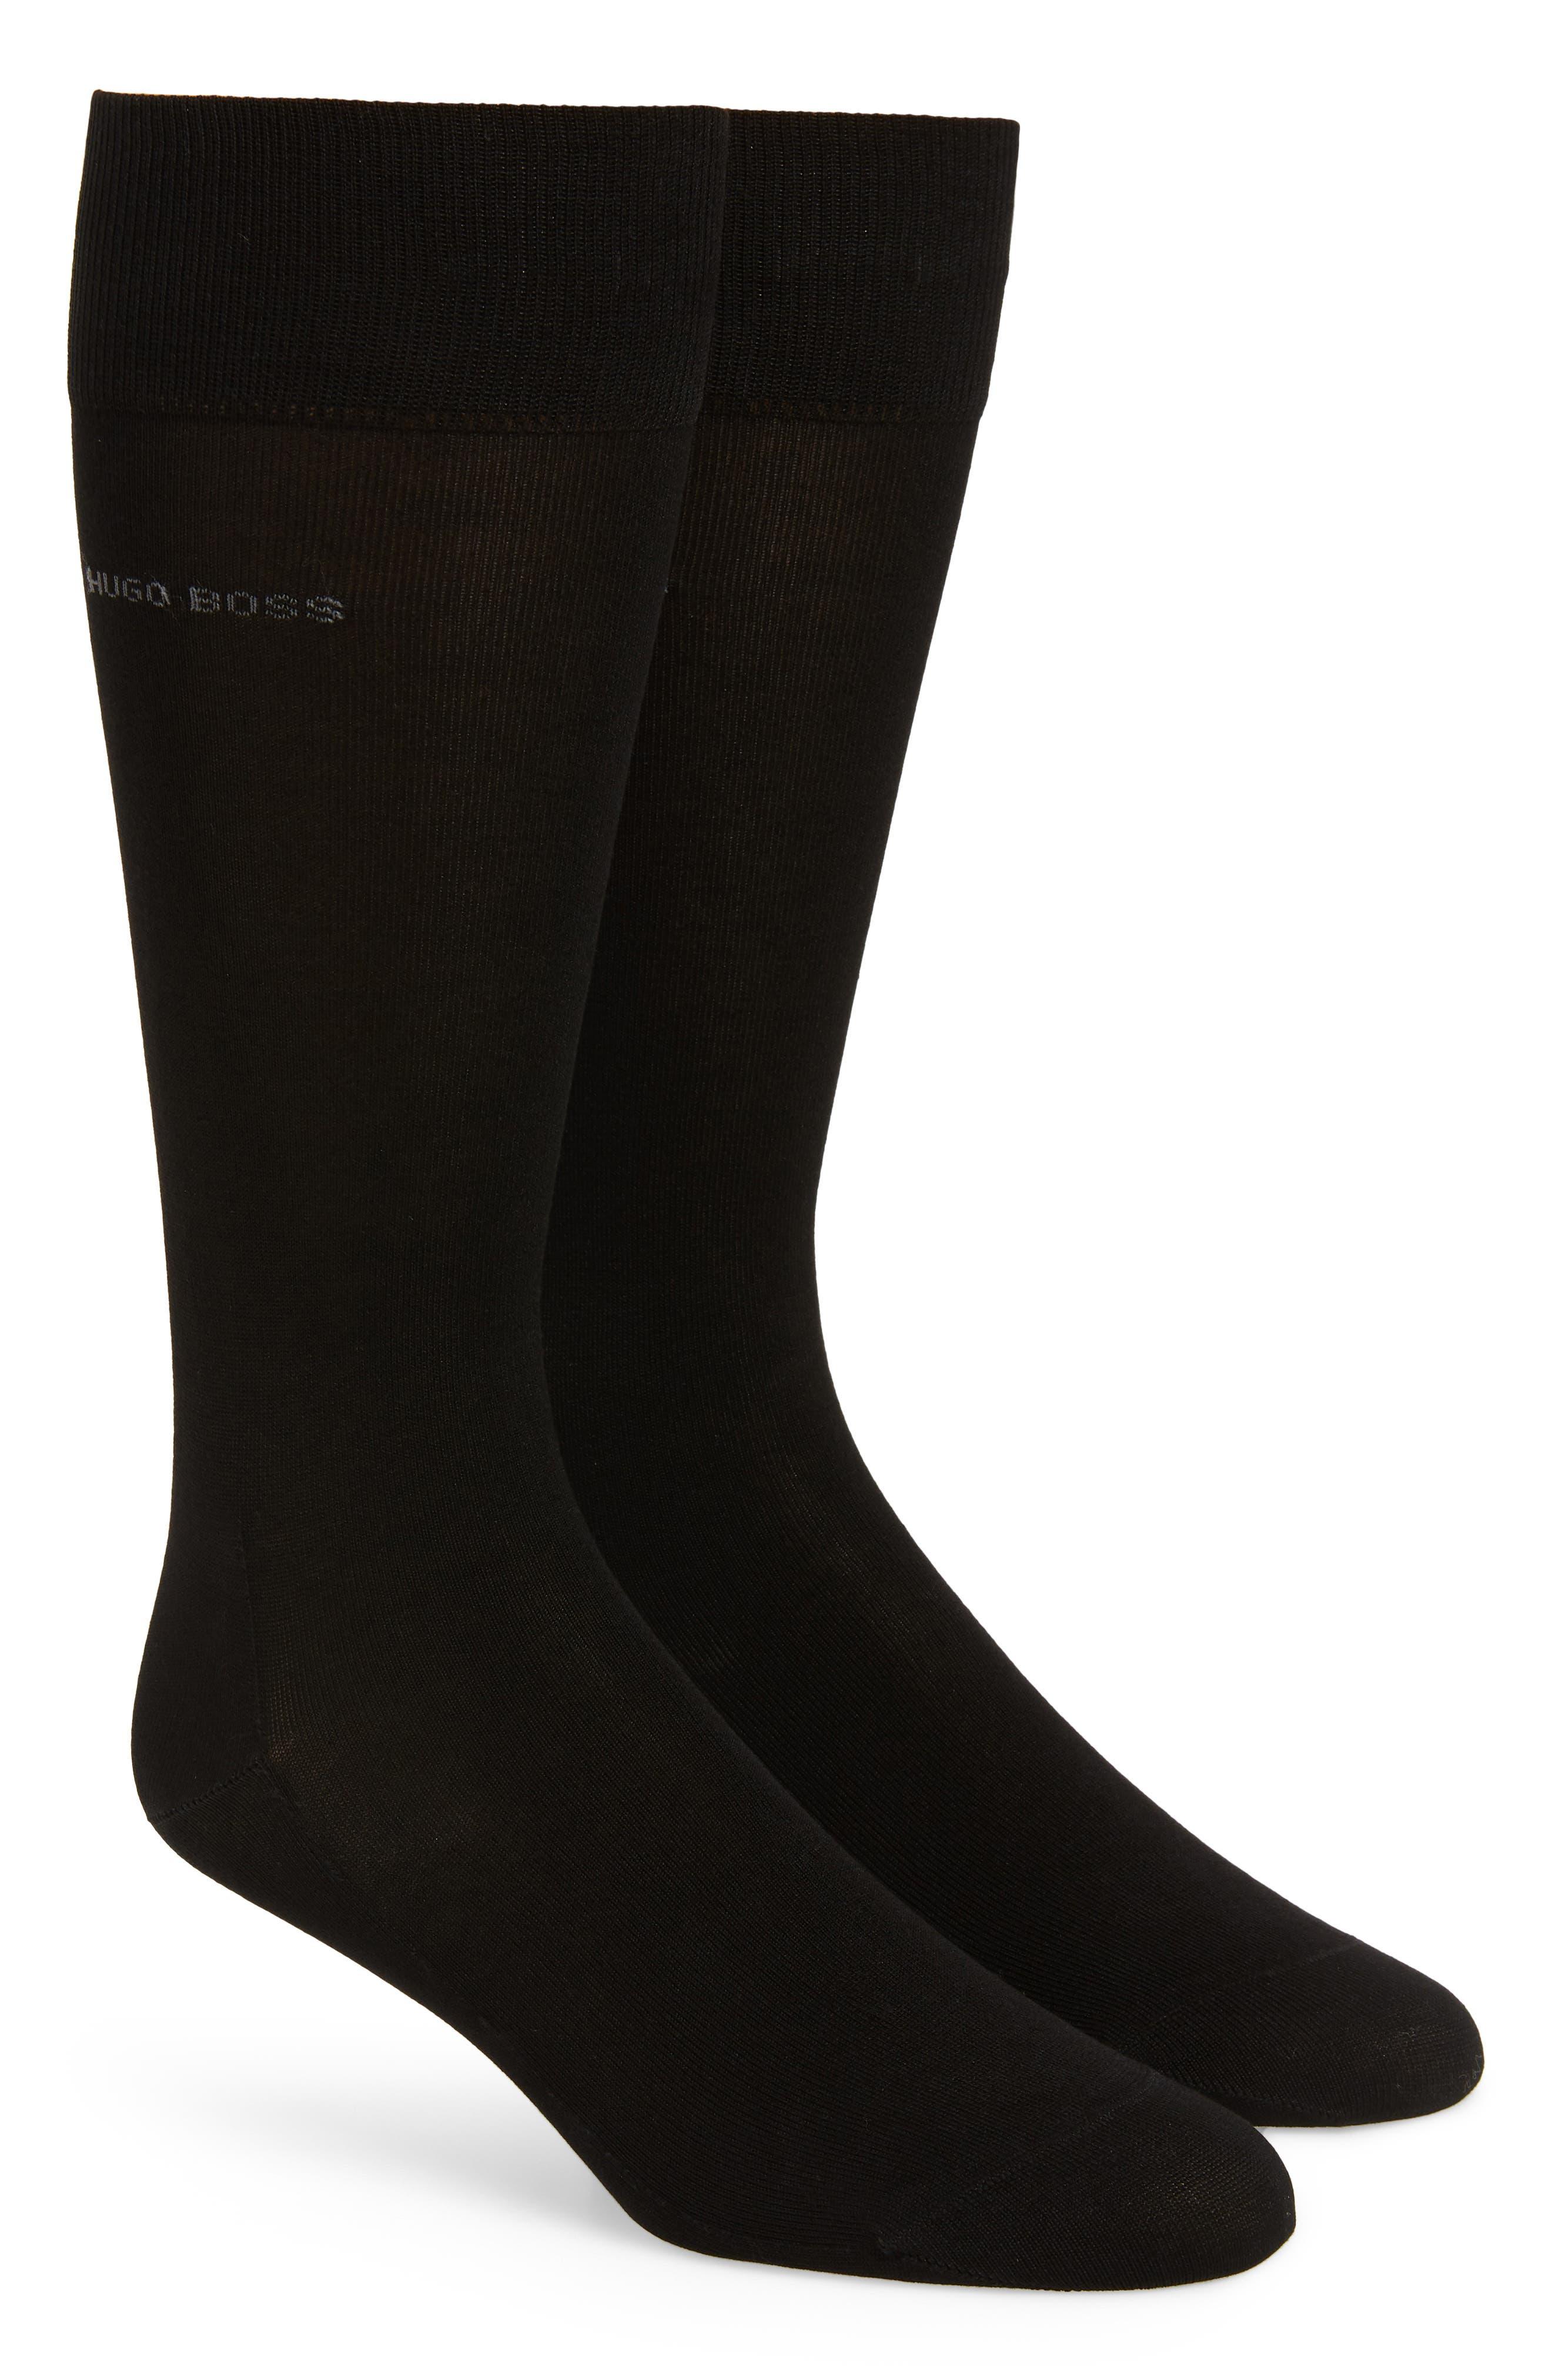 BOSS 2-Pack Solid Socks, Main, color, BLACK